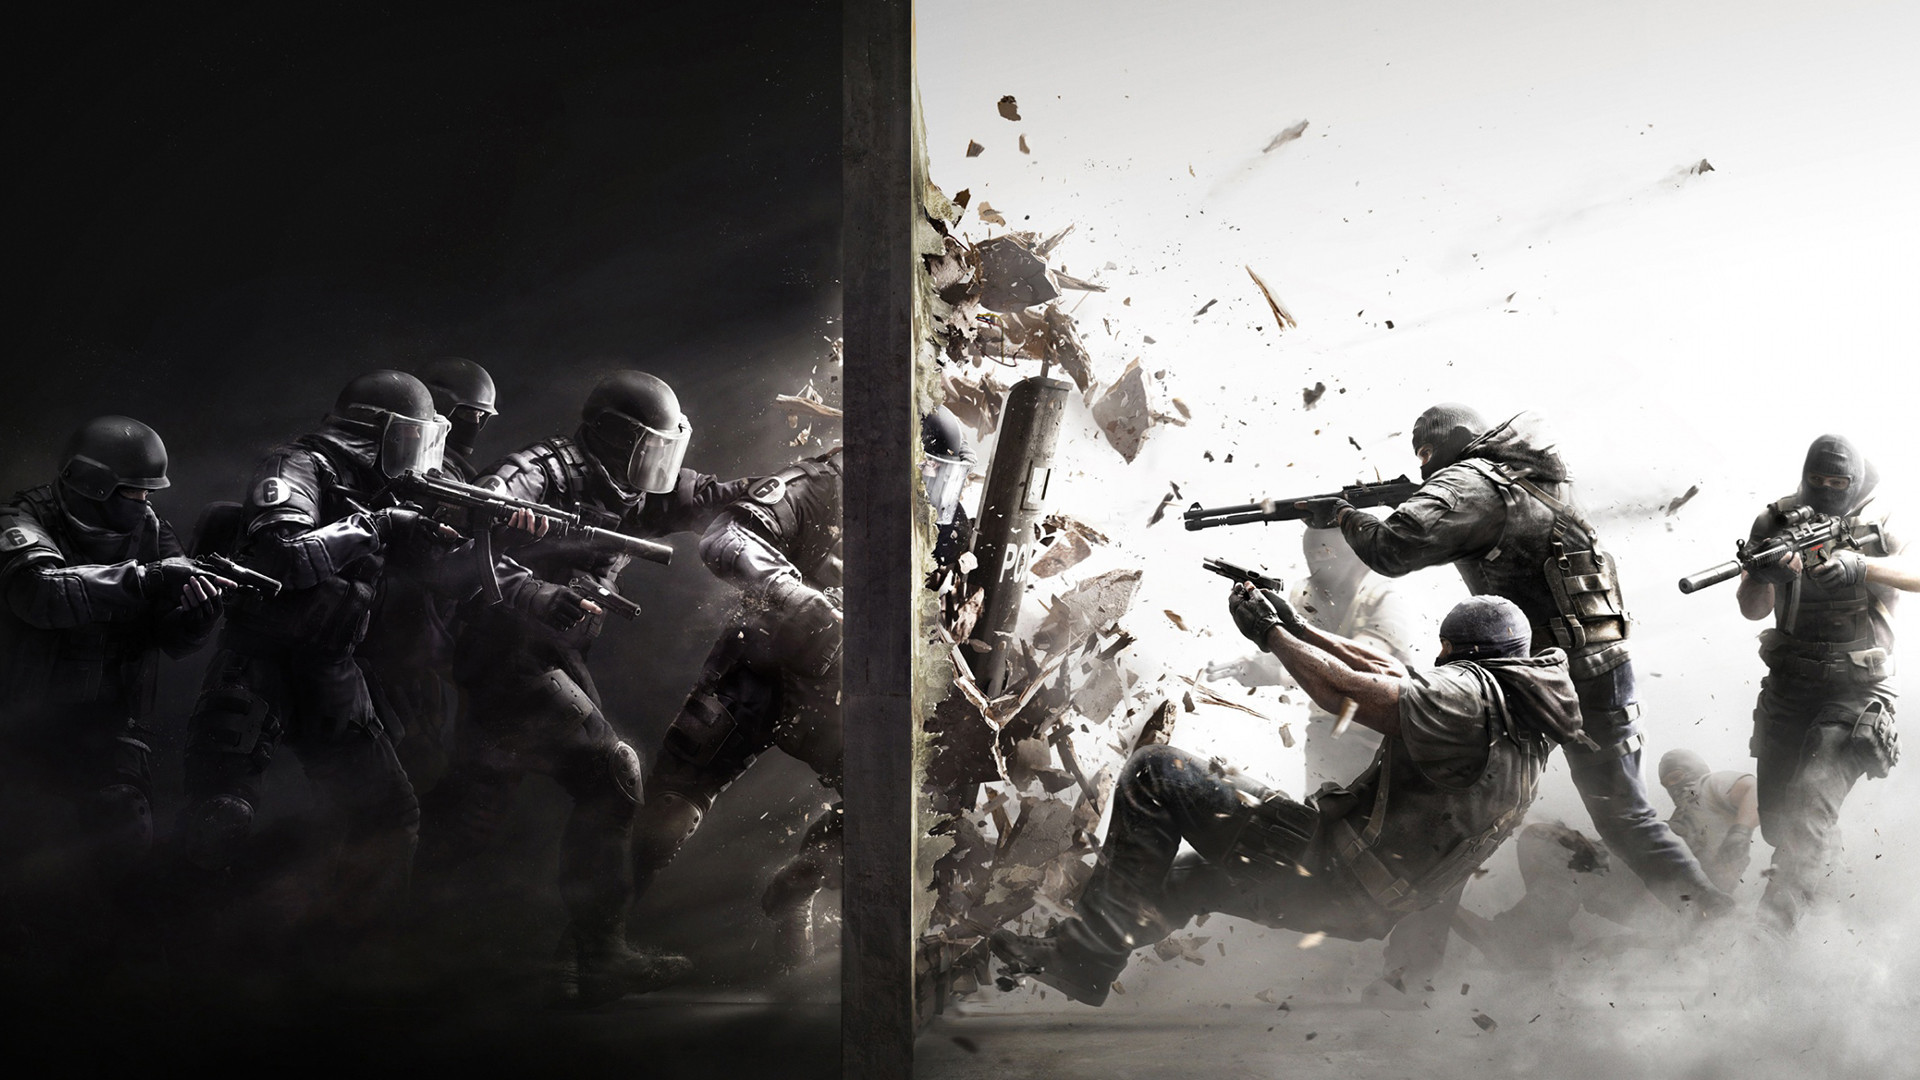 General 1920x1080 police gun debris SWAT Rainbow Six: Siege video games weapon Rainbow Six splitting soldier digital art rifles video game art 2015 (Year) PC gaming